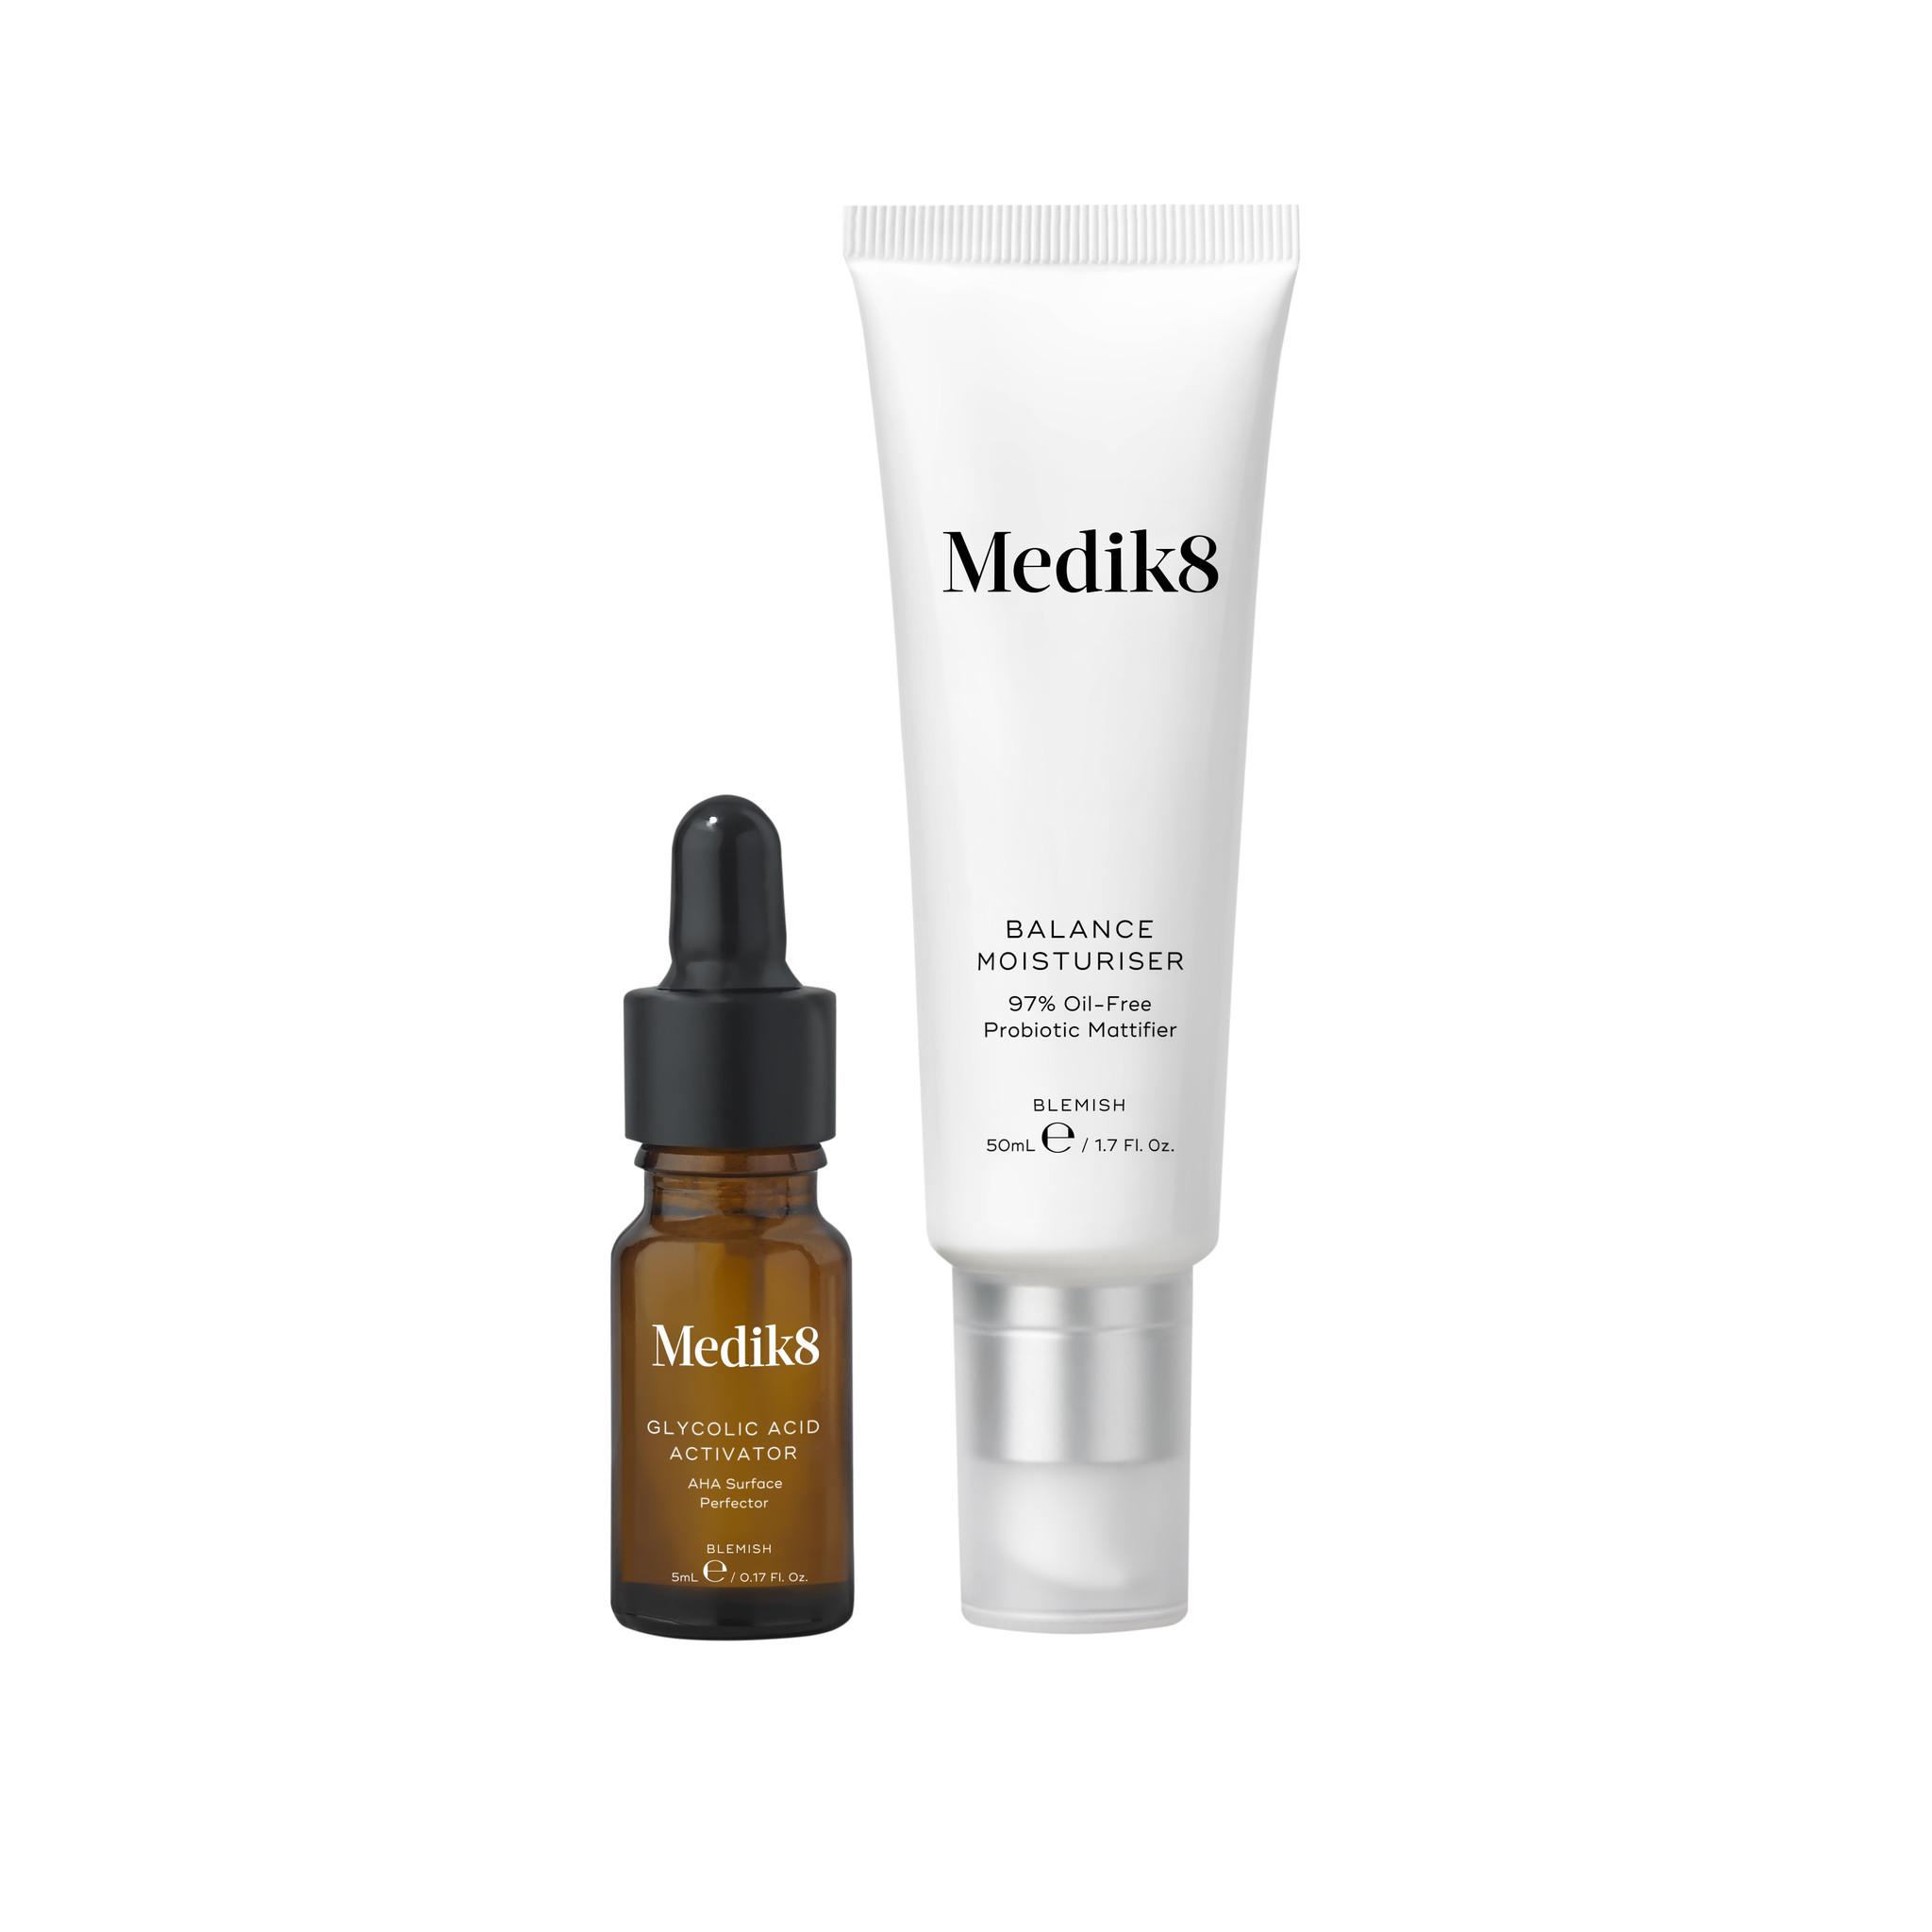 Medik8 Balance Moisturiser & Glycolic Acid Activator | 50ml & 5ml